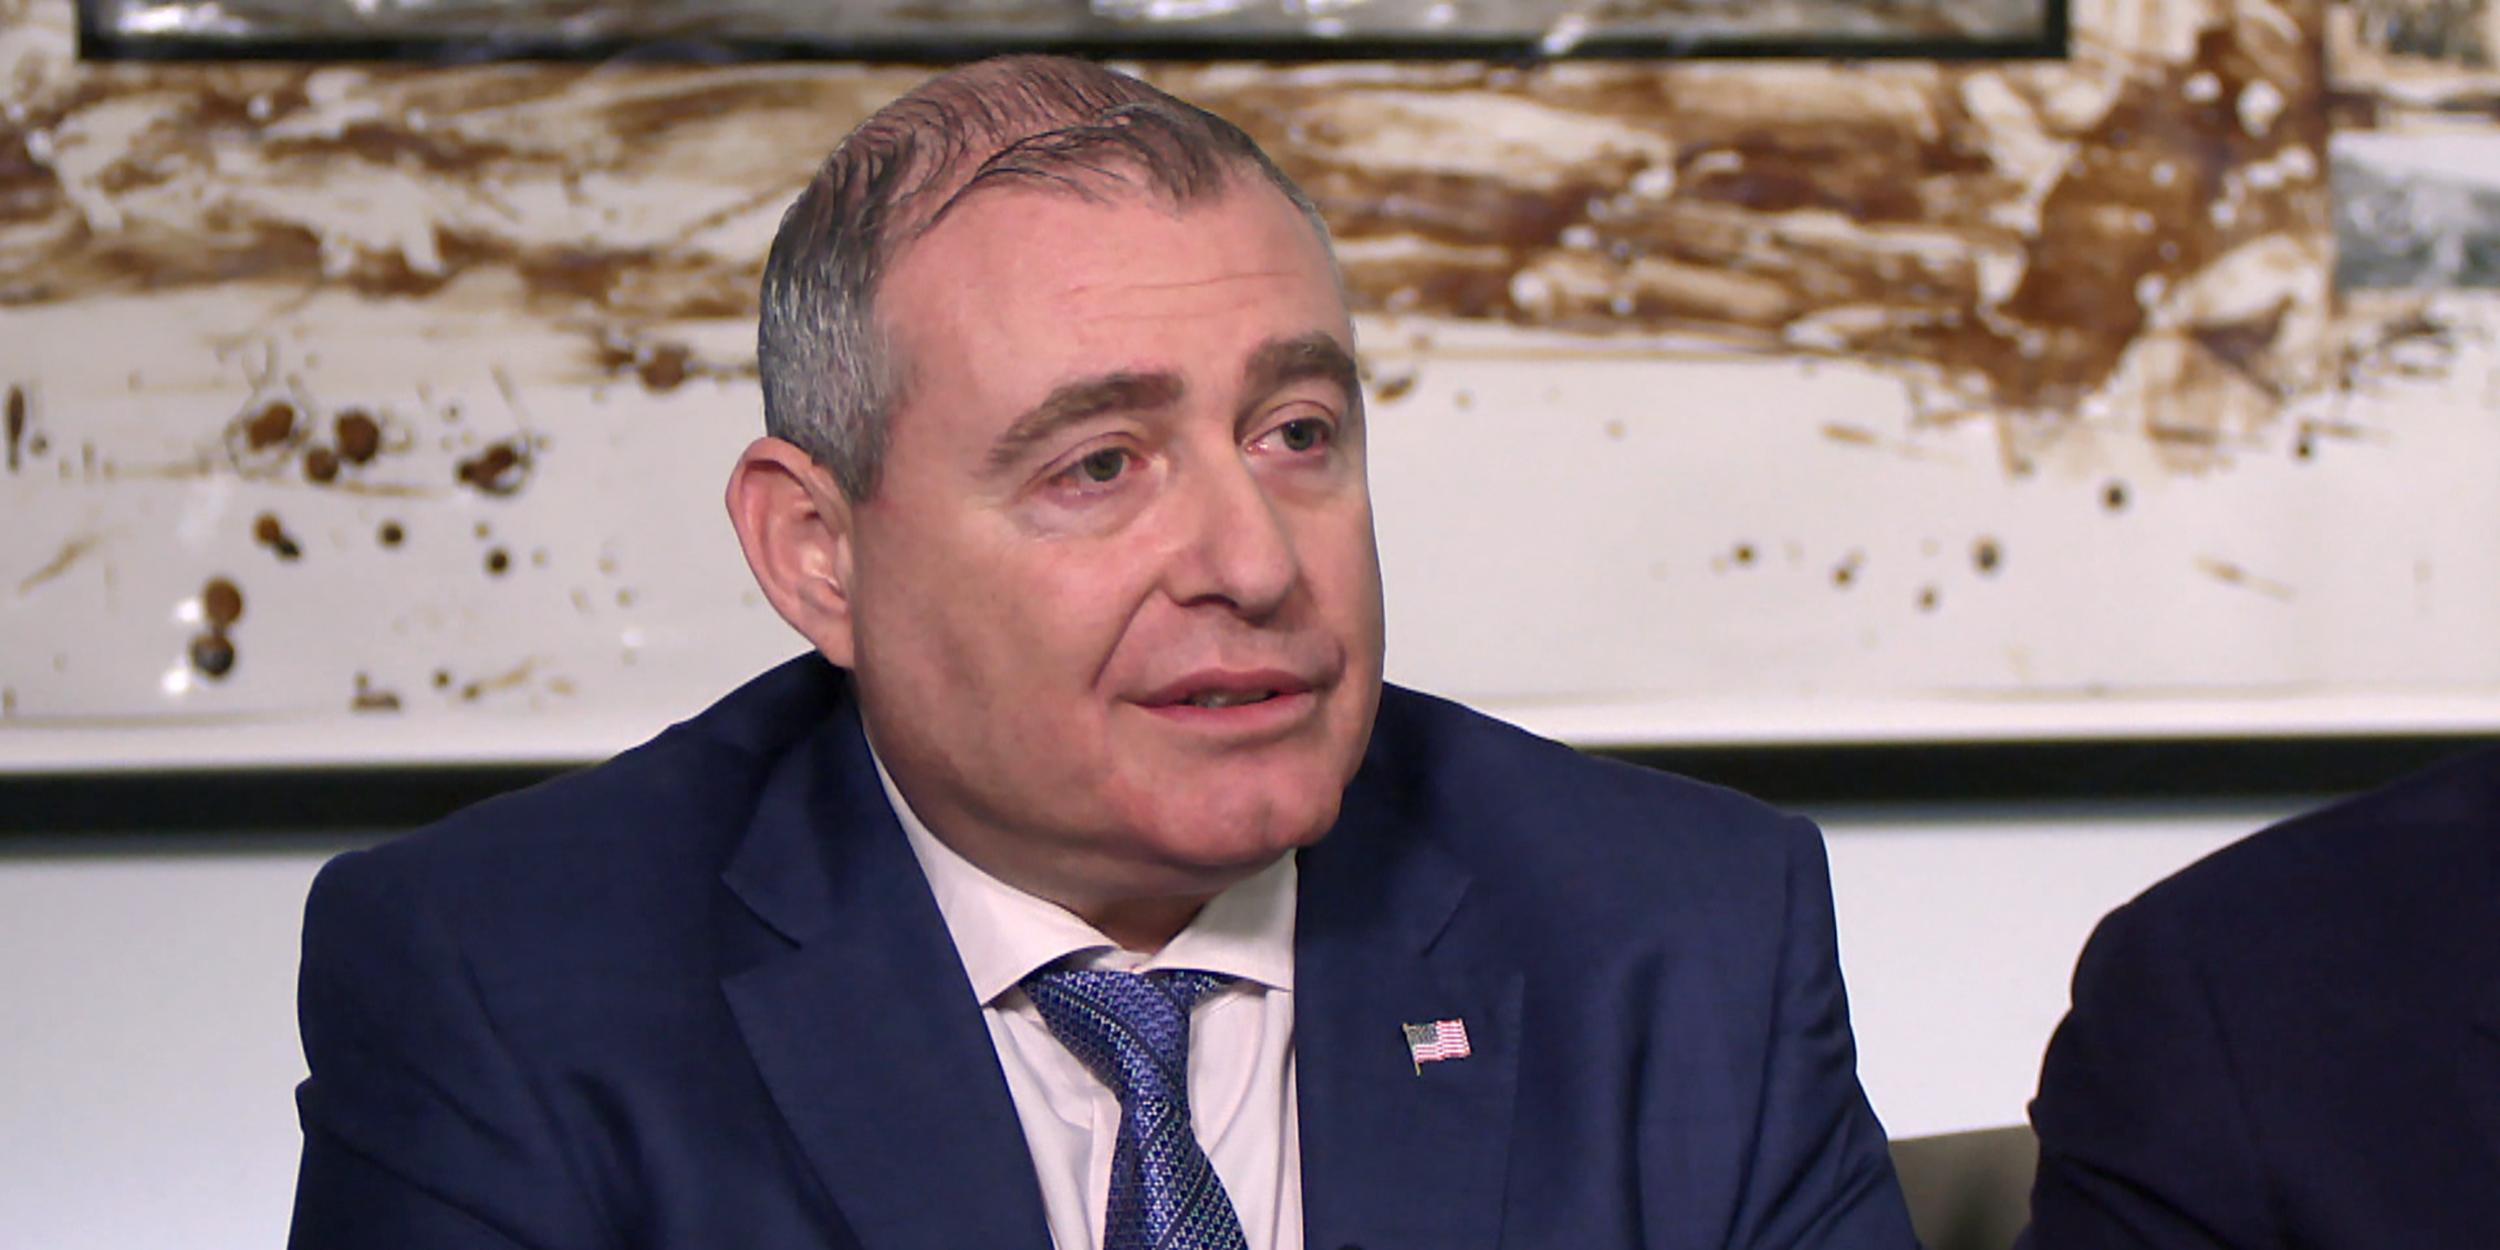 Giuliani associate Parnas says Trump ordered Ukraine ambassador's firing several times before recall